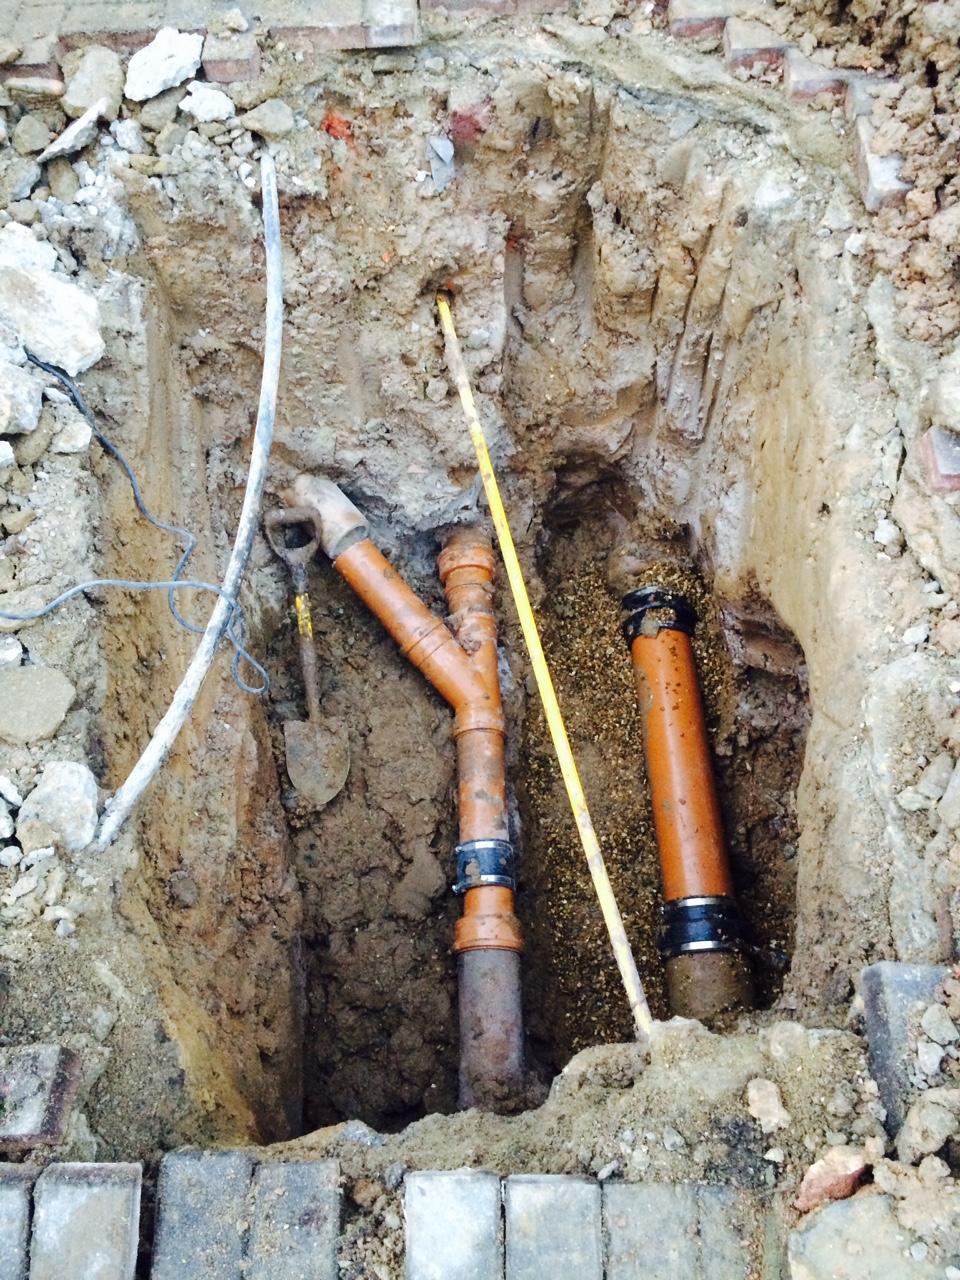 london drain repairs installations drainlocal